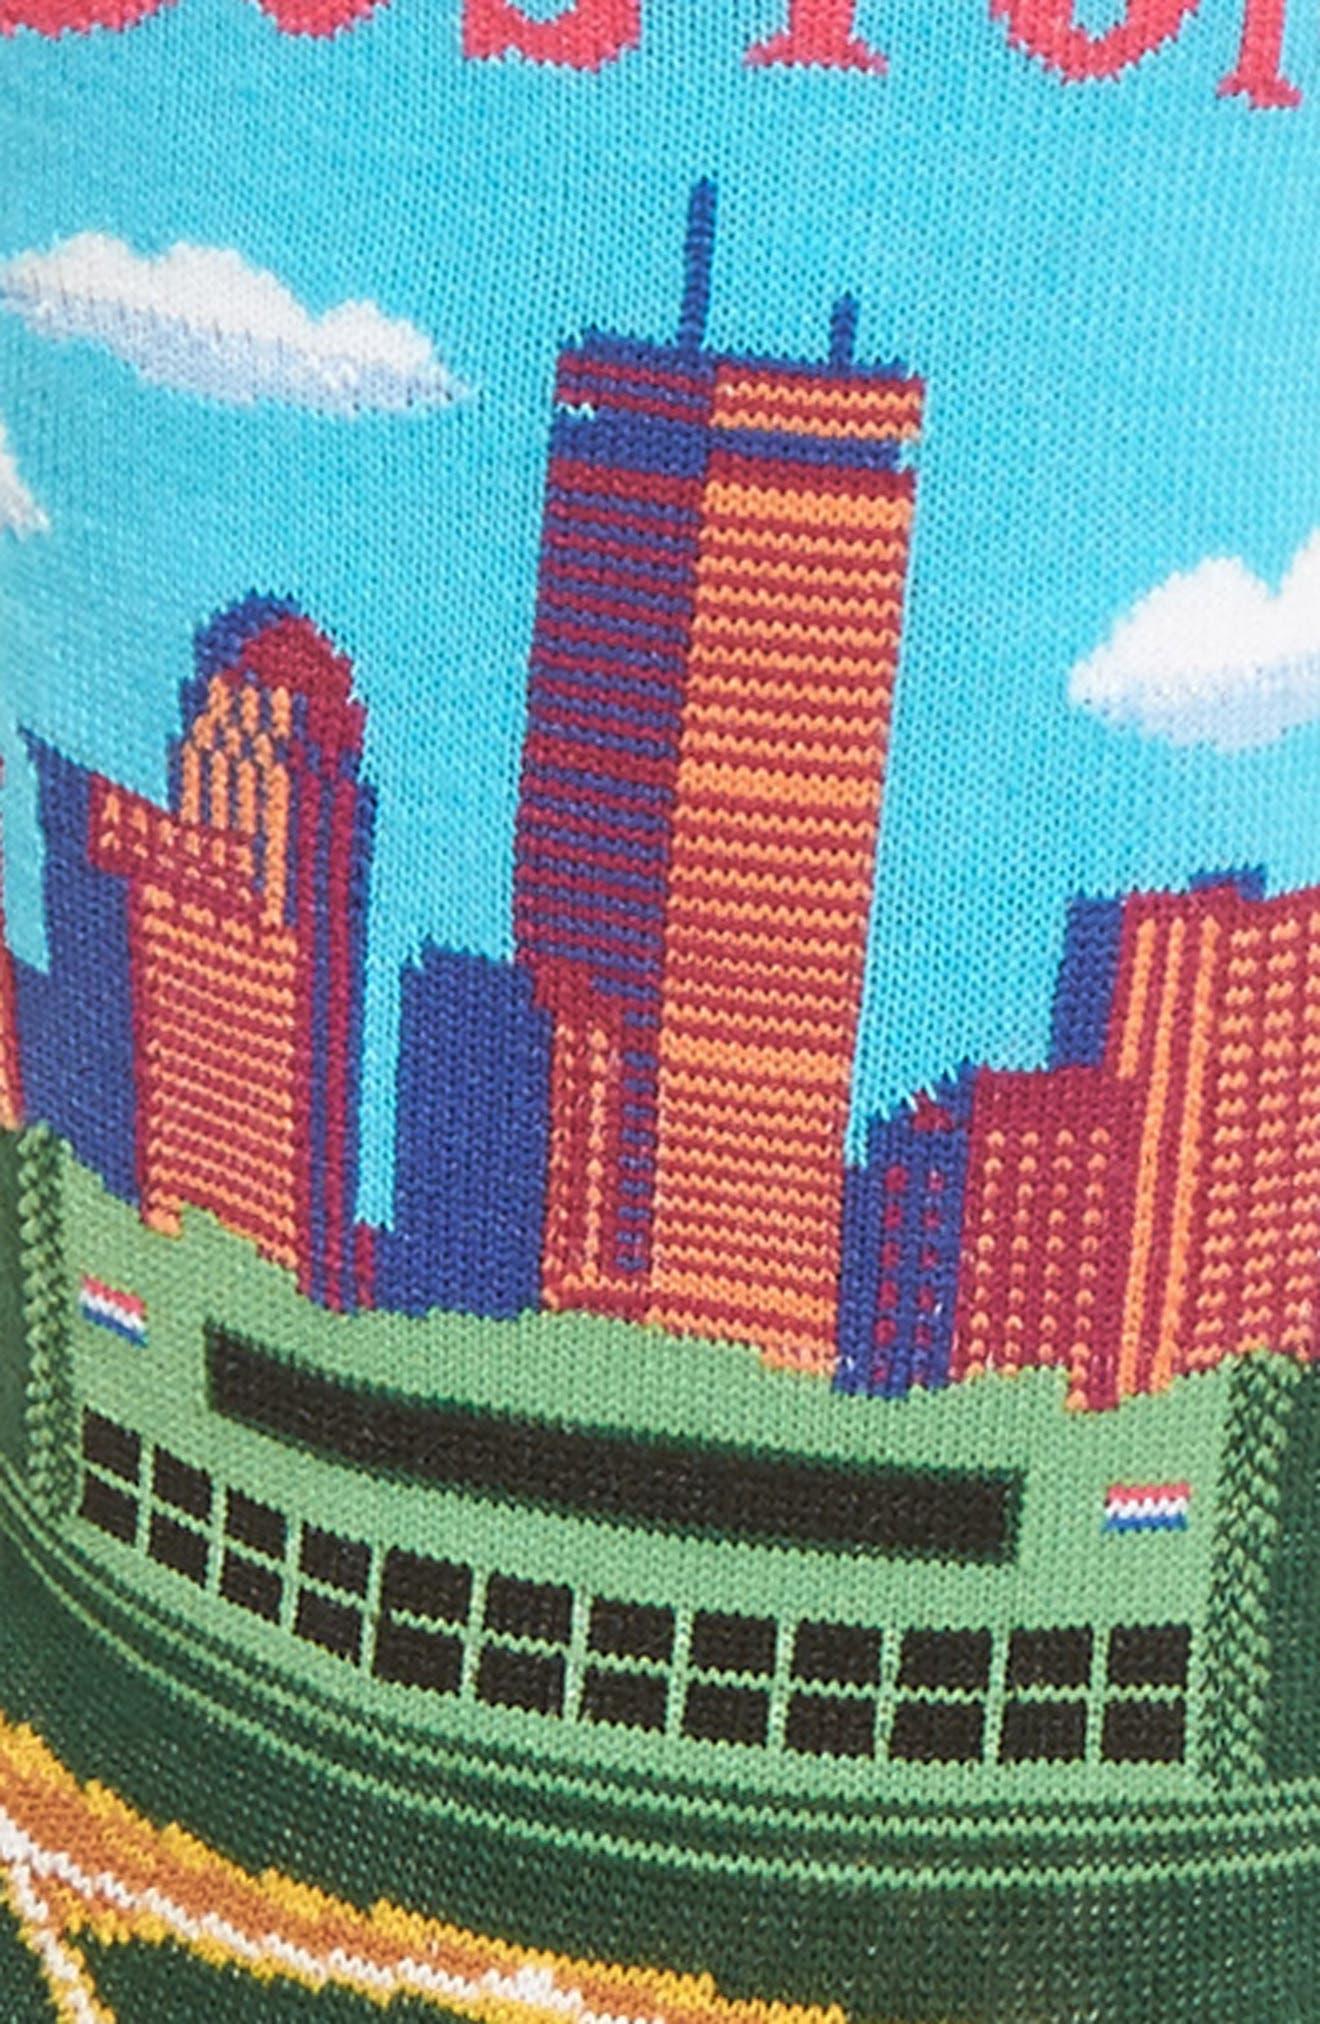 Travel Series - Boston Crew Socks,                             Alternate thumbnail 2, color,                             Light Blue